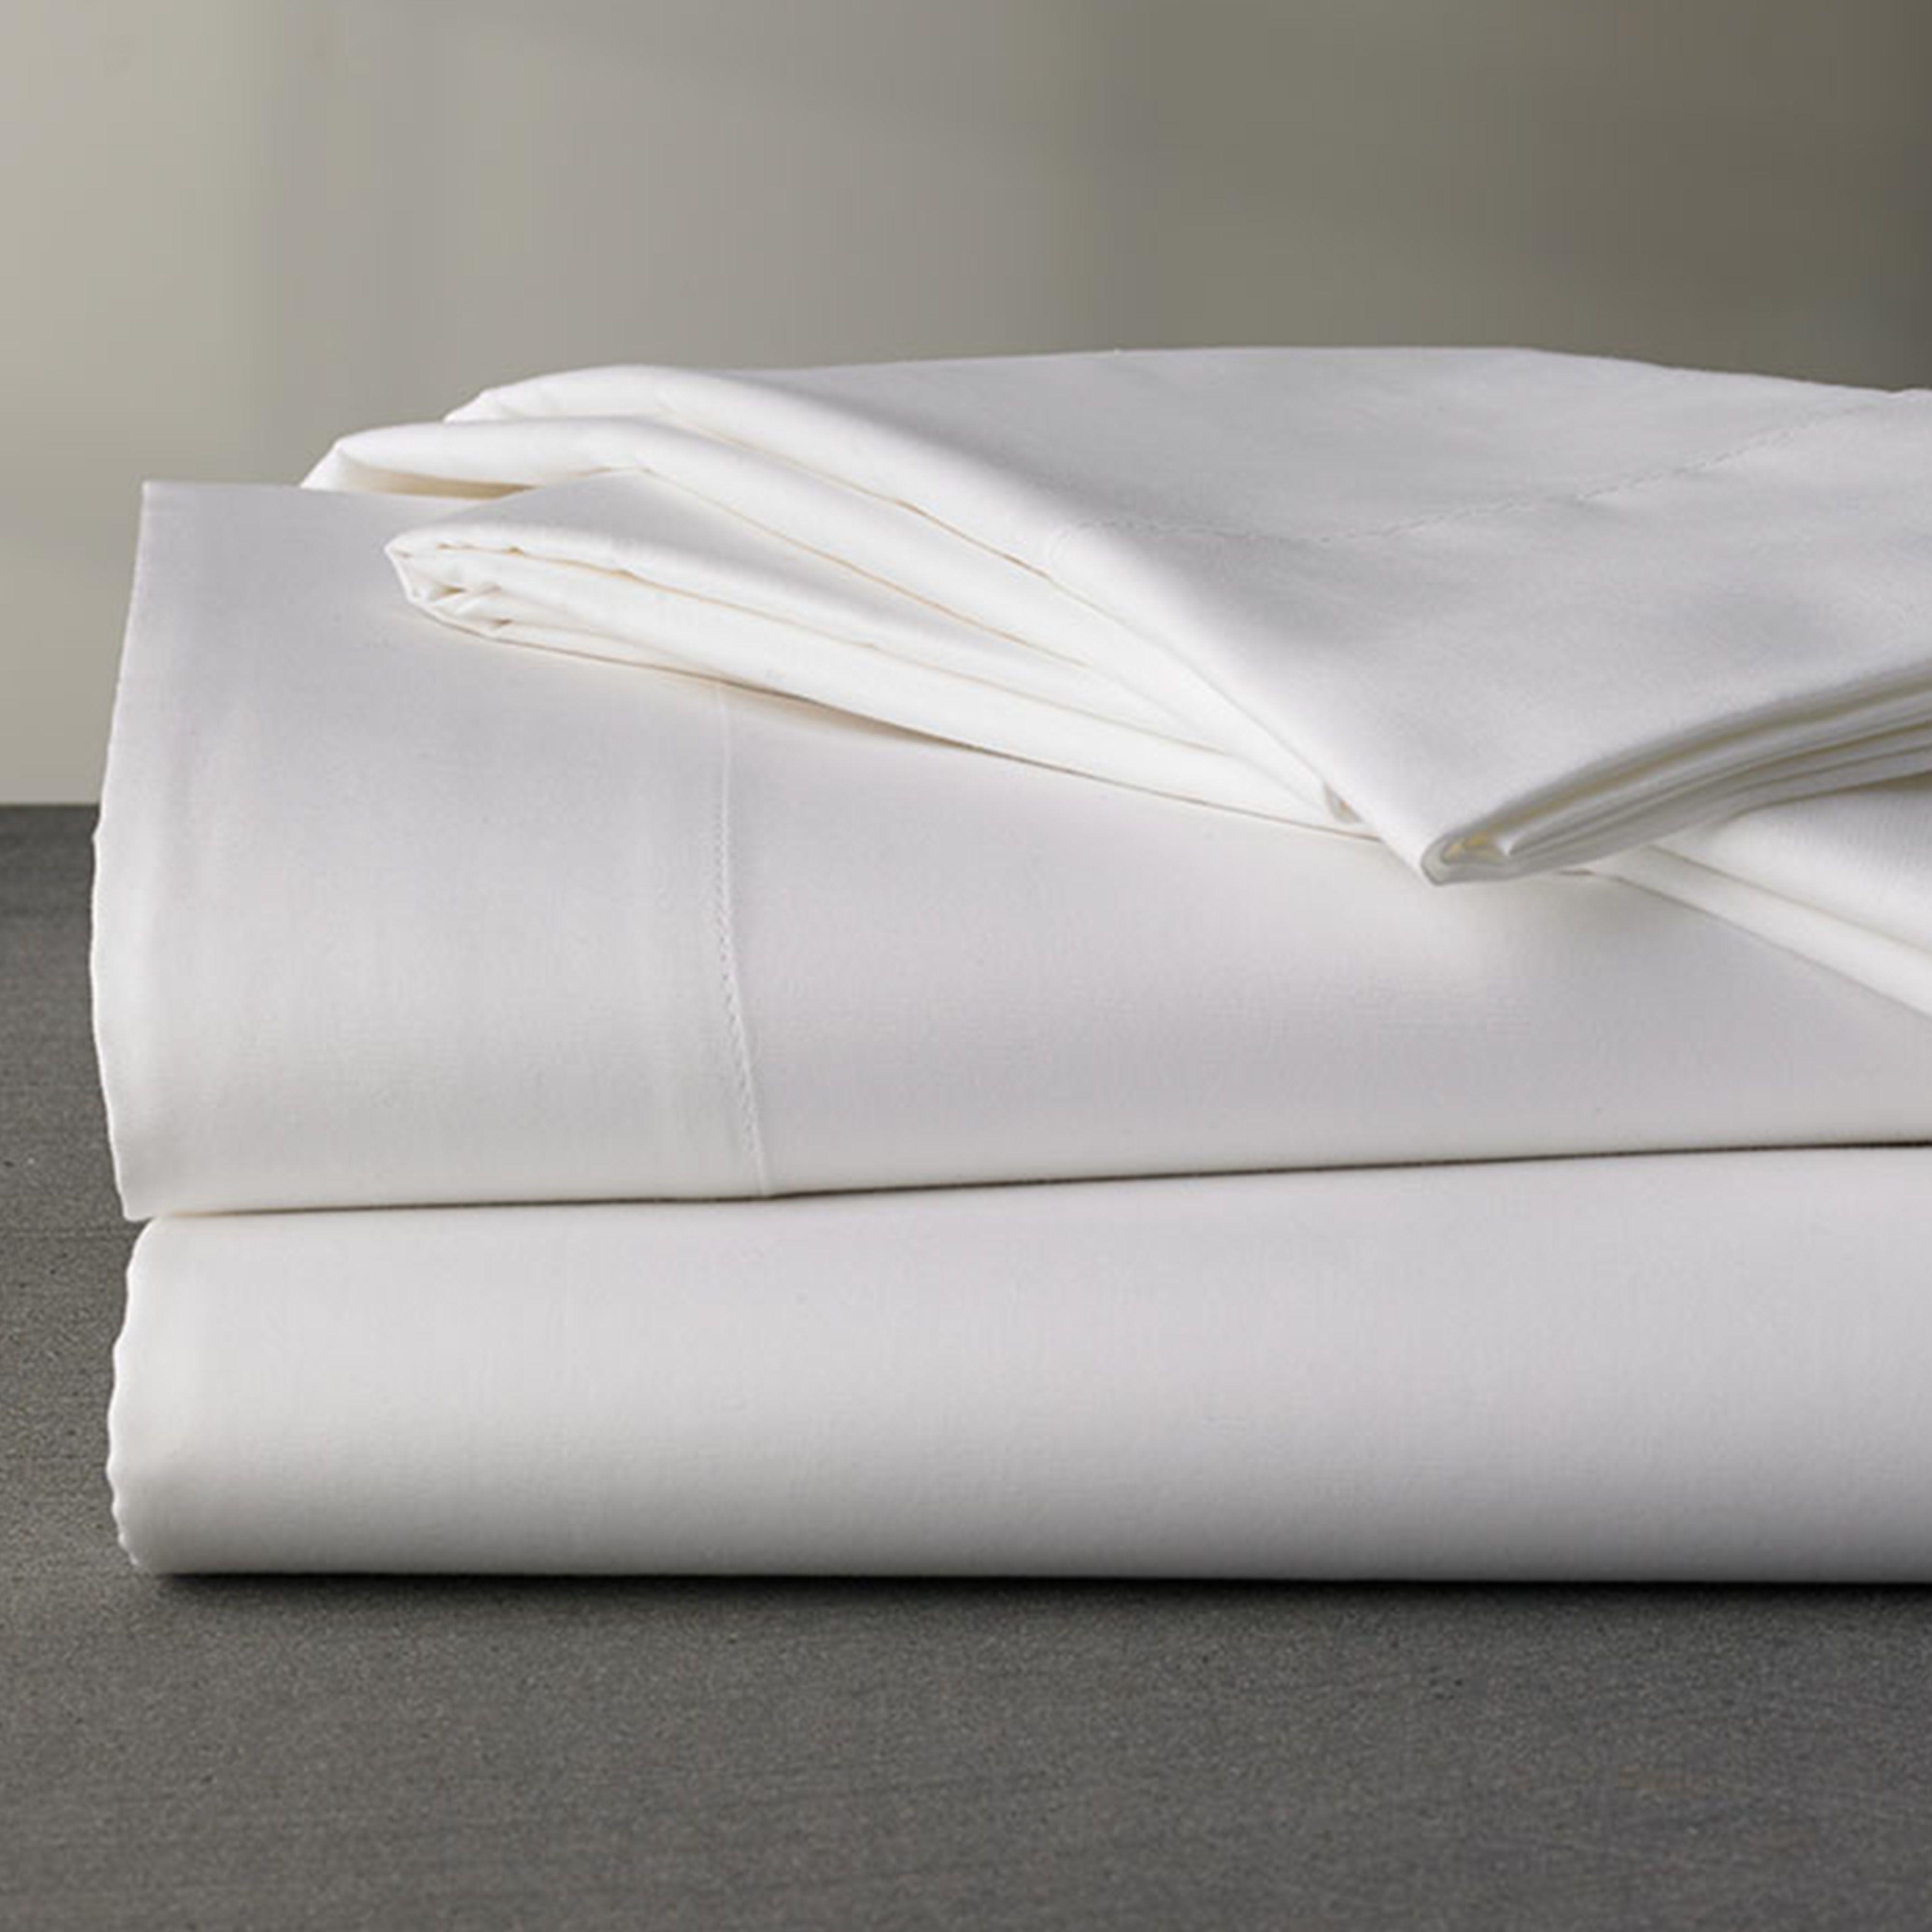 w sheet